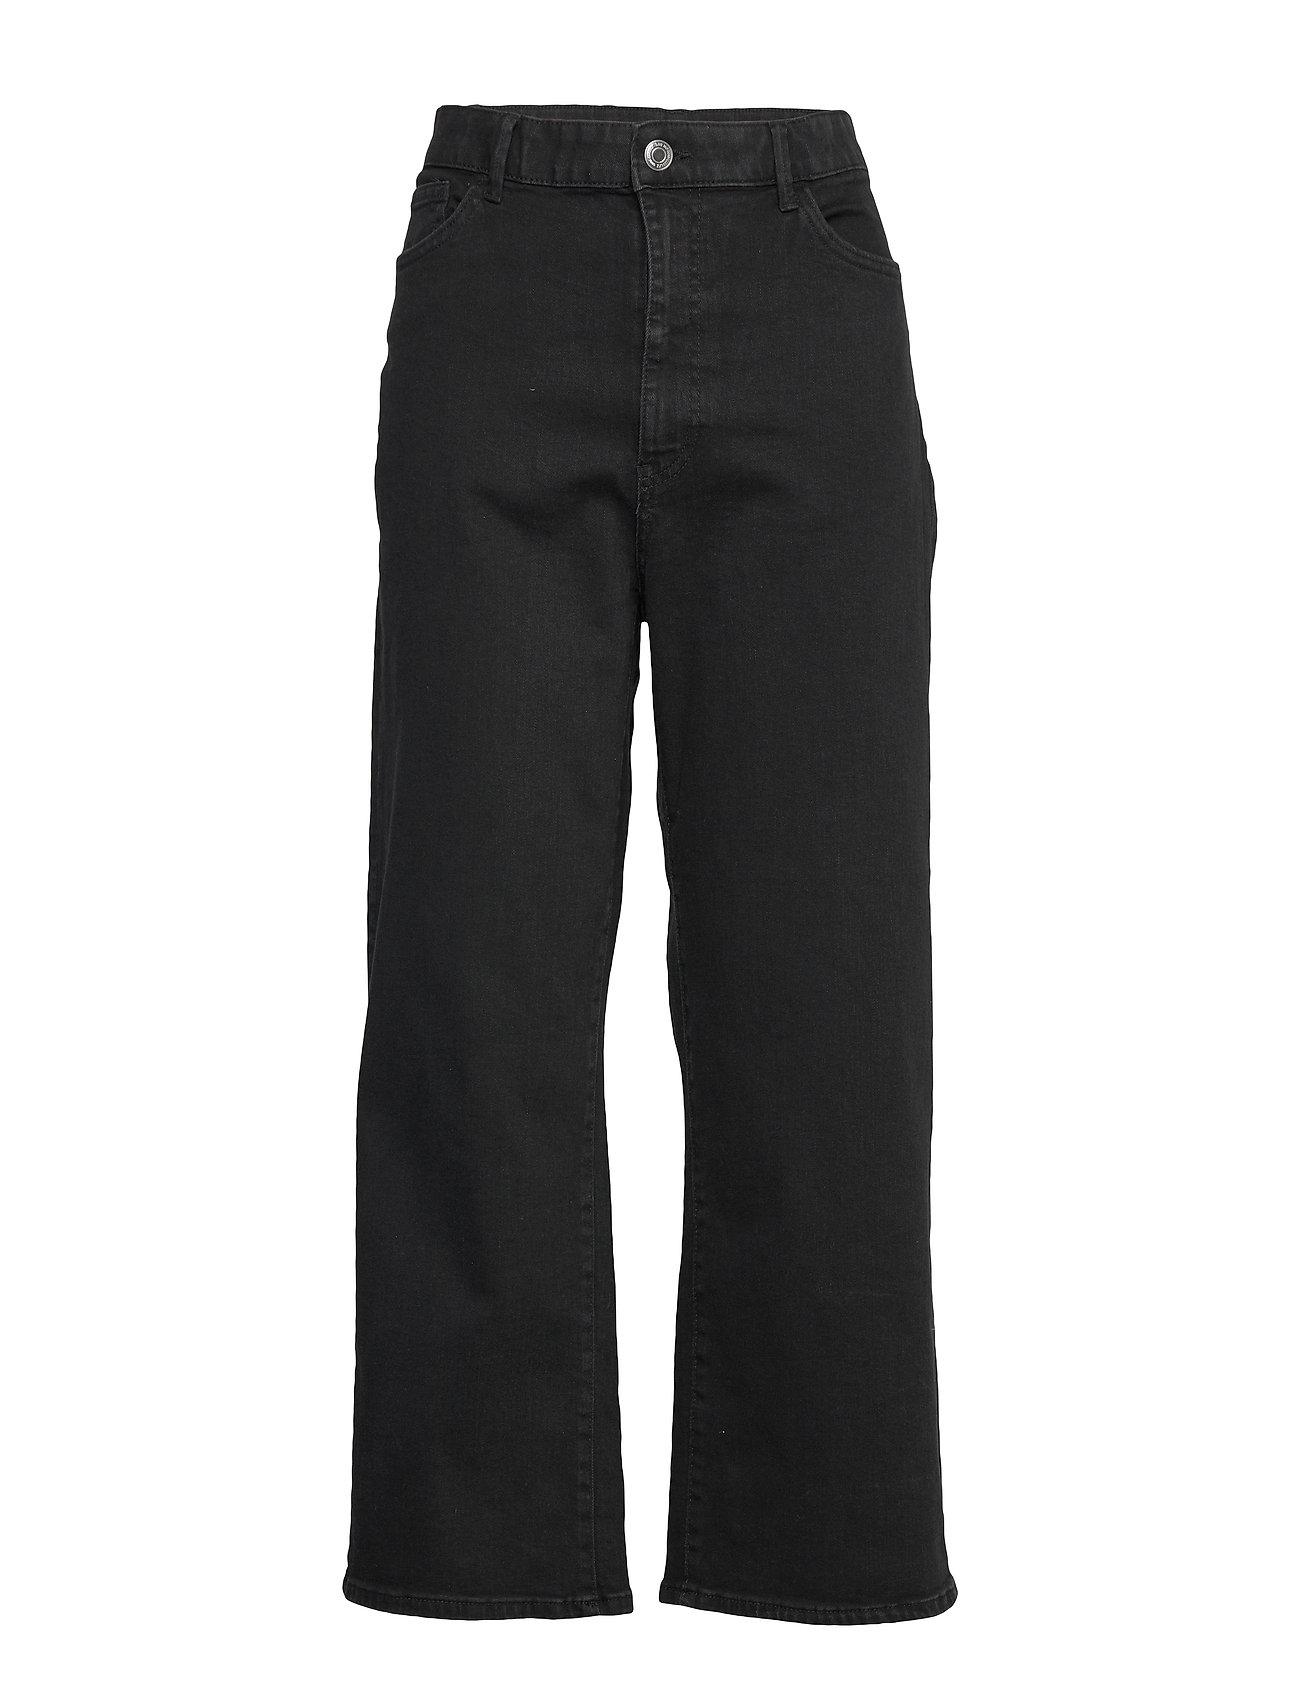 Trousers Denim Hanna Black Vide Jeans Sort Lindex